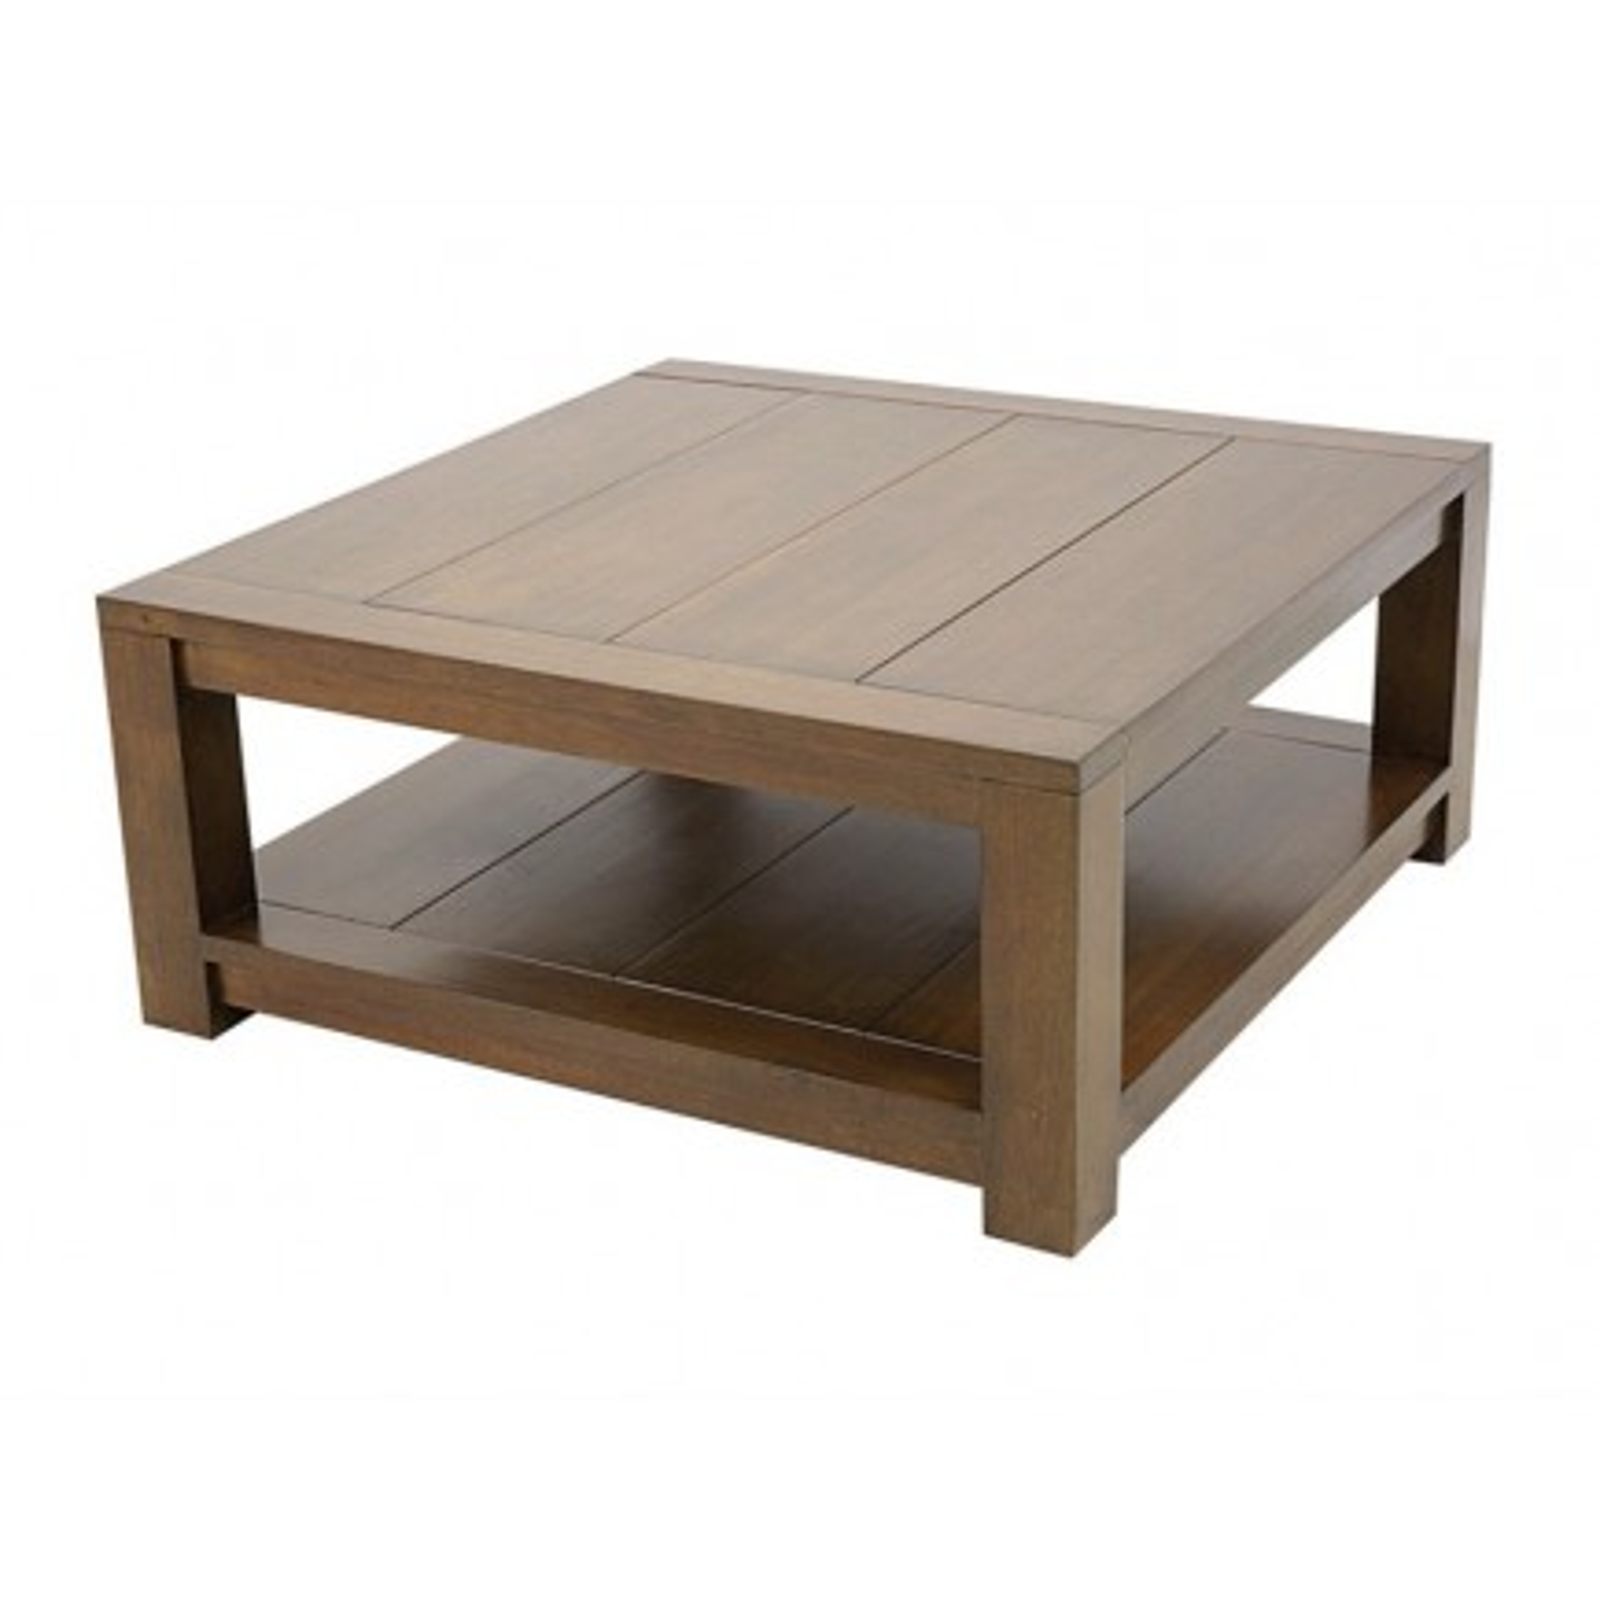 Table Basse Double Plateau Broadway Hévéa - meuble bois massif